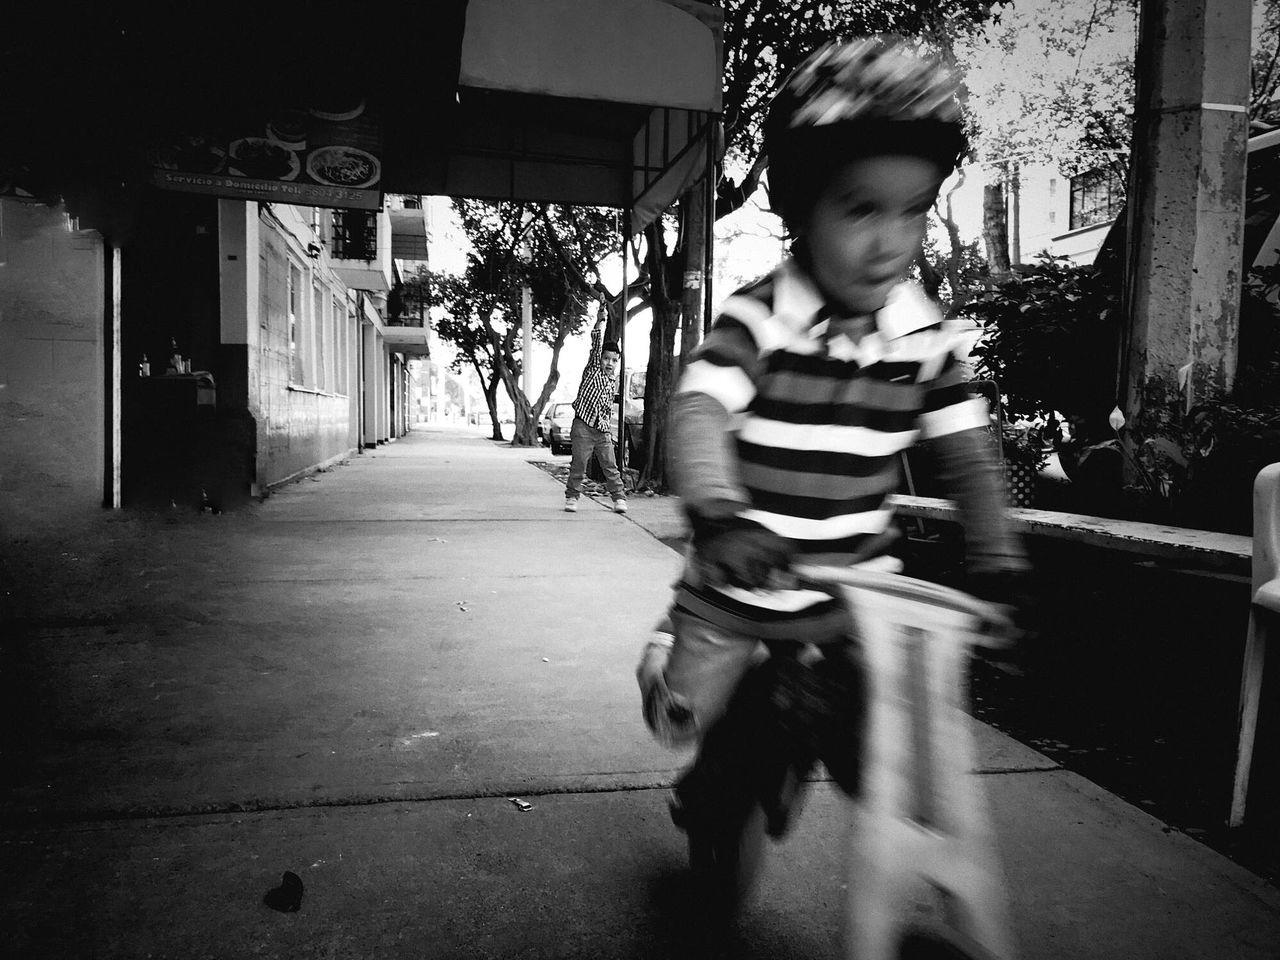 Kids Being Kids Mexicocity  Streetphotography Blackandwhite Monochrome Fun Lifestyles IPhone7Plus Outdoors